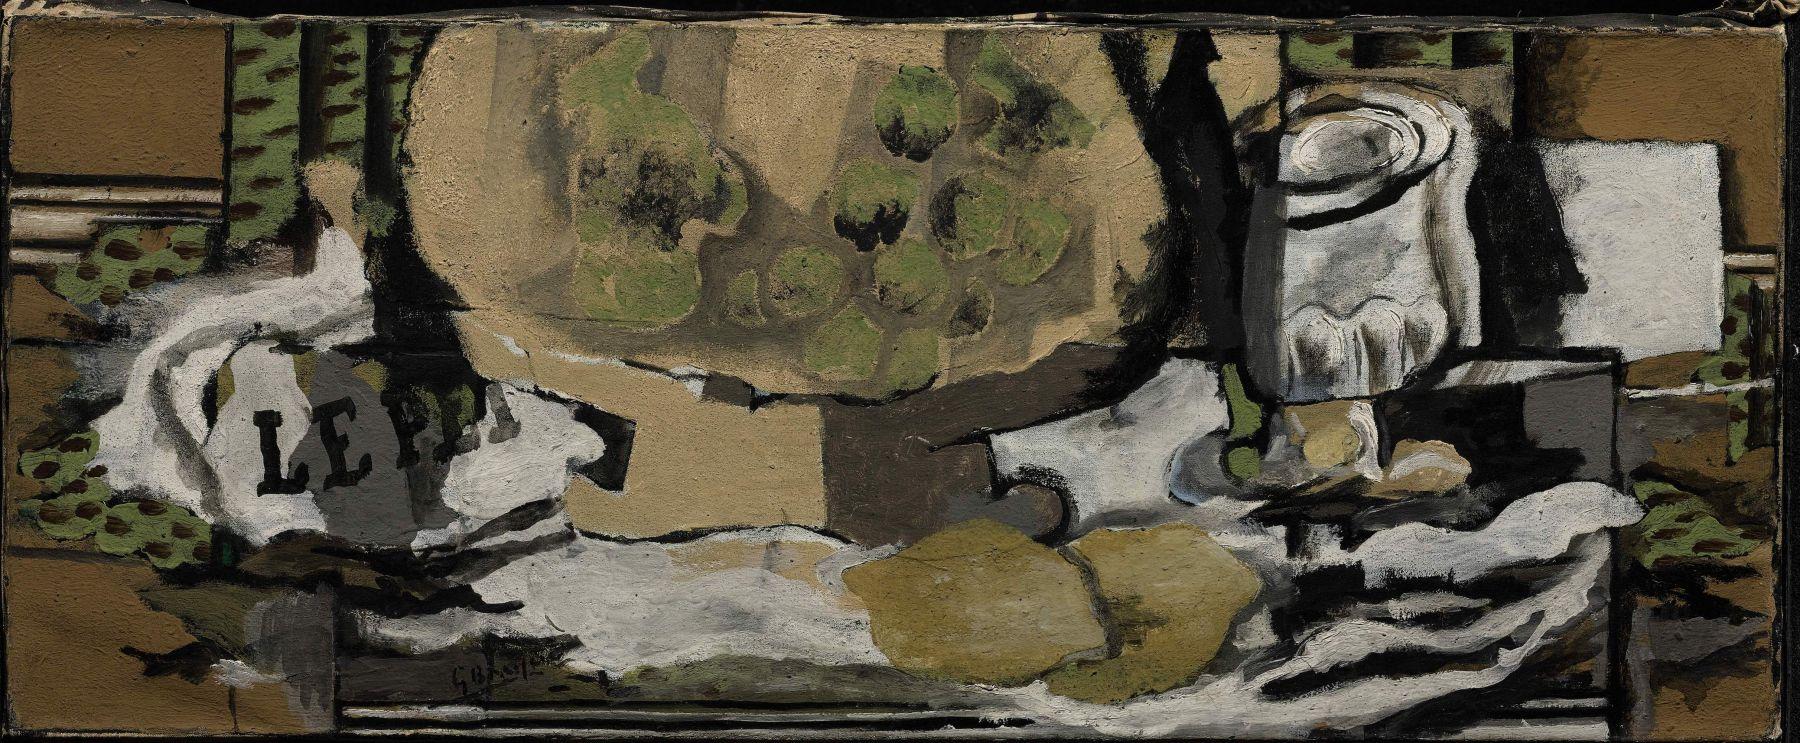 Georges Braque, Verre et Compotier, 1922 Oil on canvas 26.5 x 65.5 cm. (10 3/8 x 25 3/4 in.)